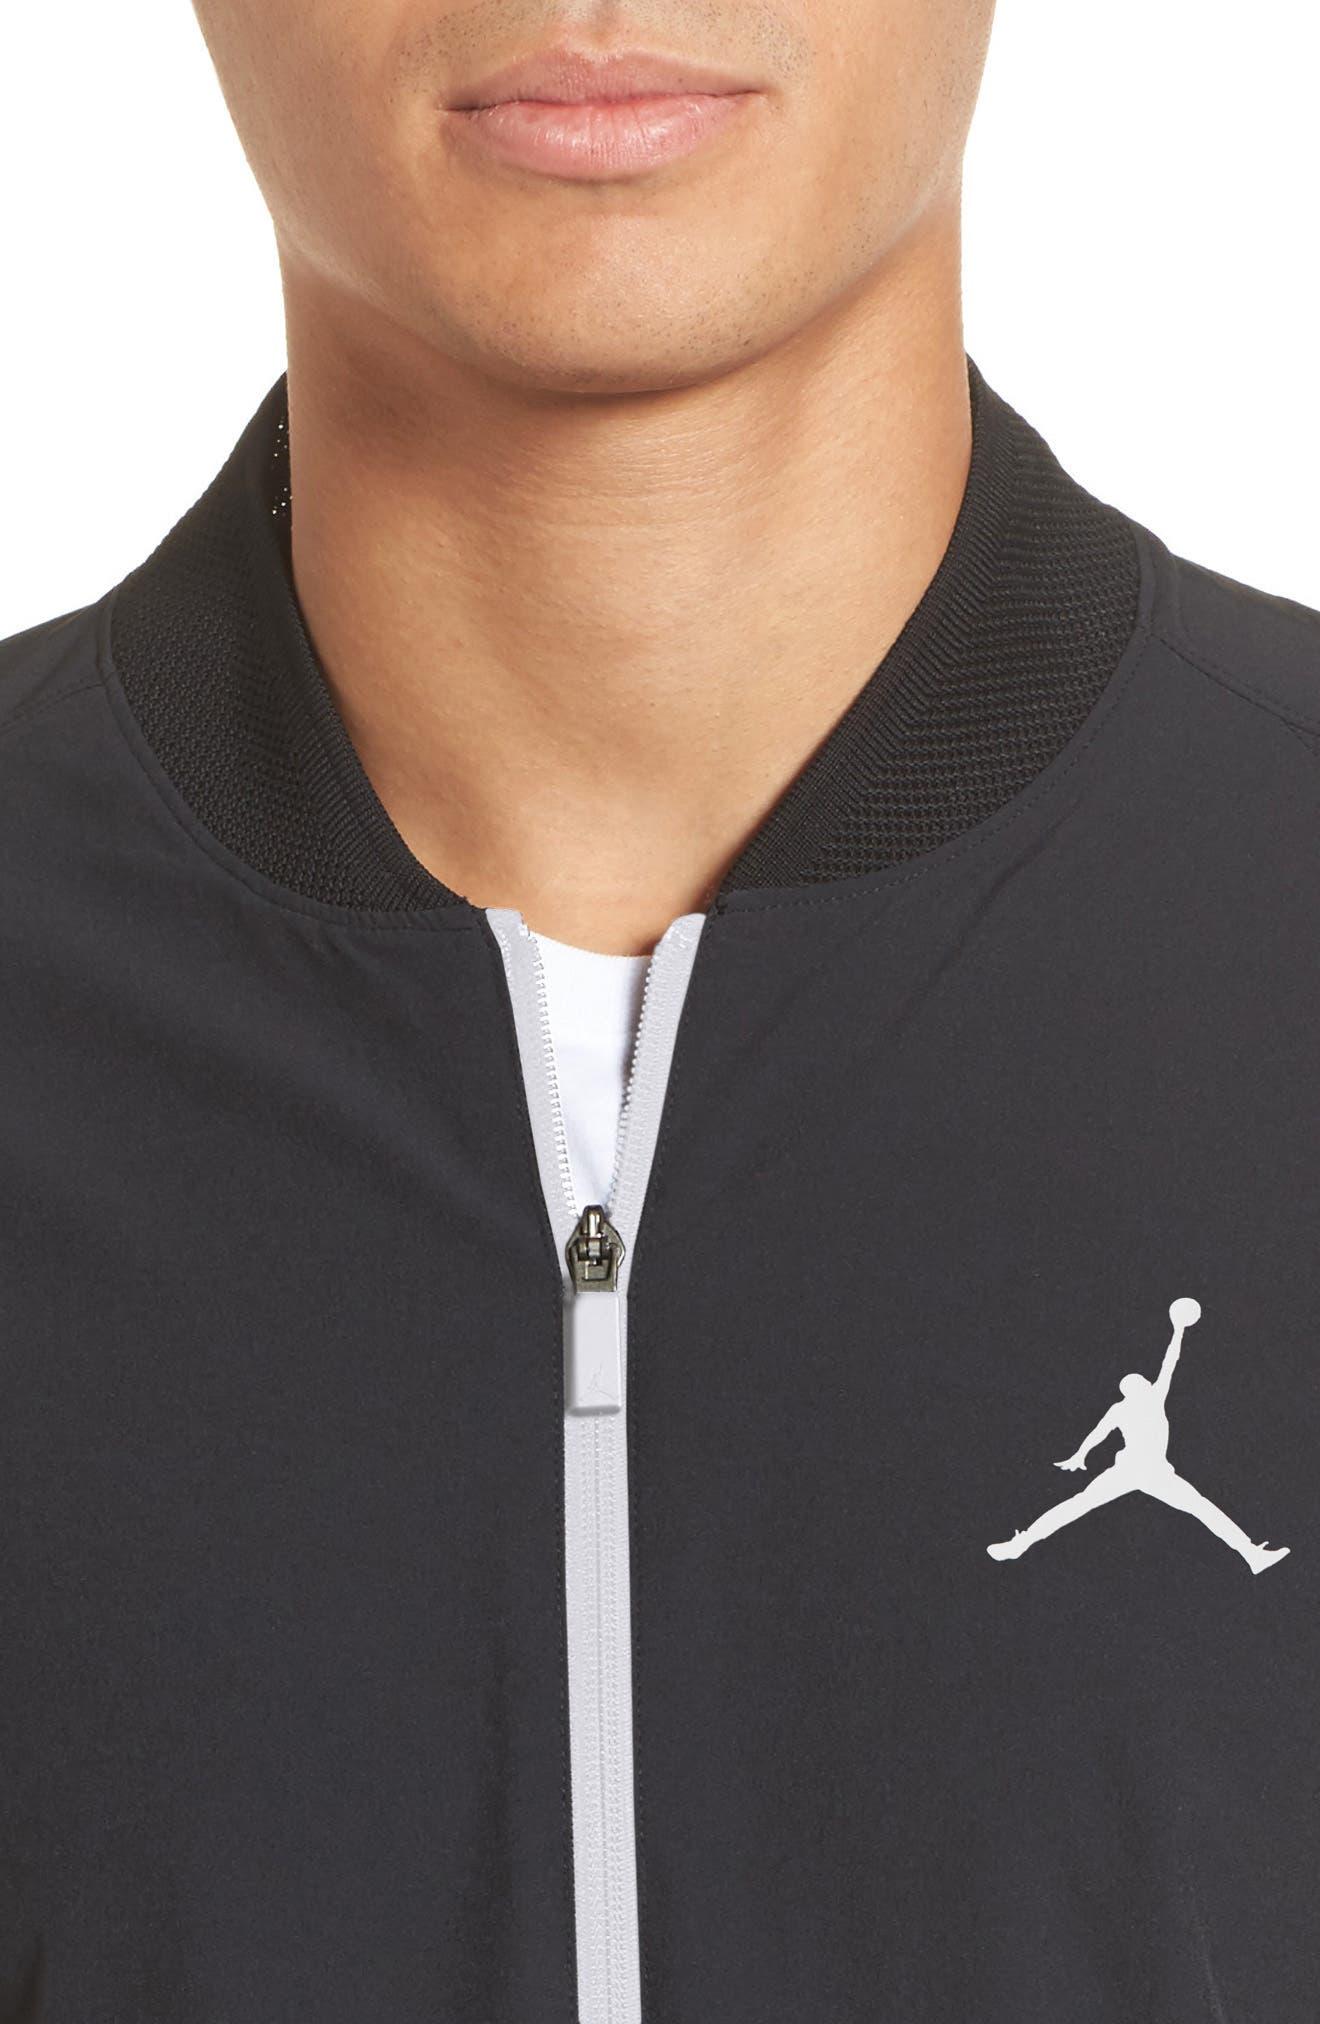 23 Alpha Dry Jacket,                             Alternate thumbnail 3, color,                             Black/ White